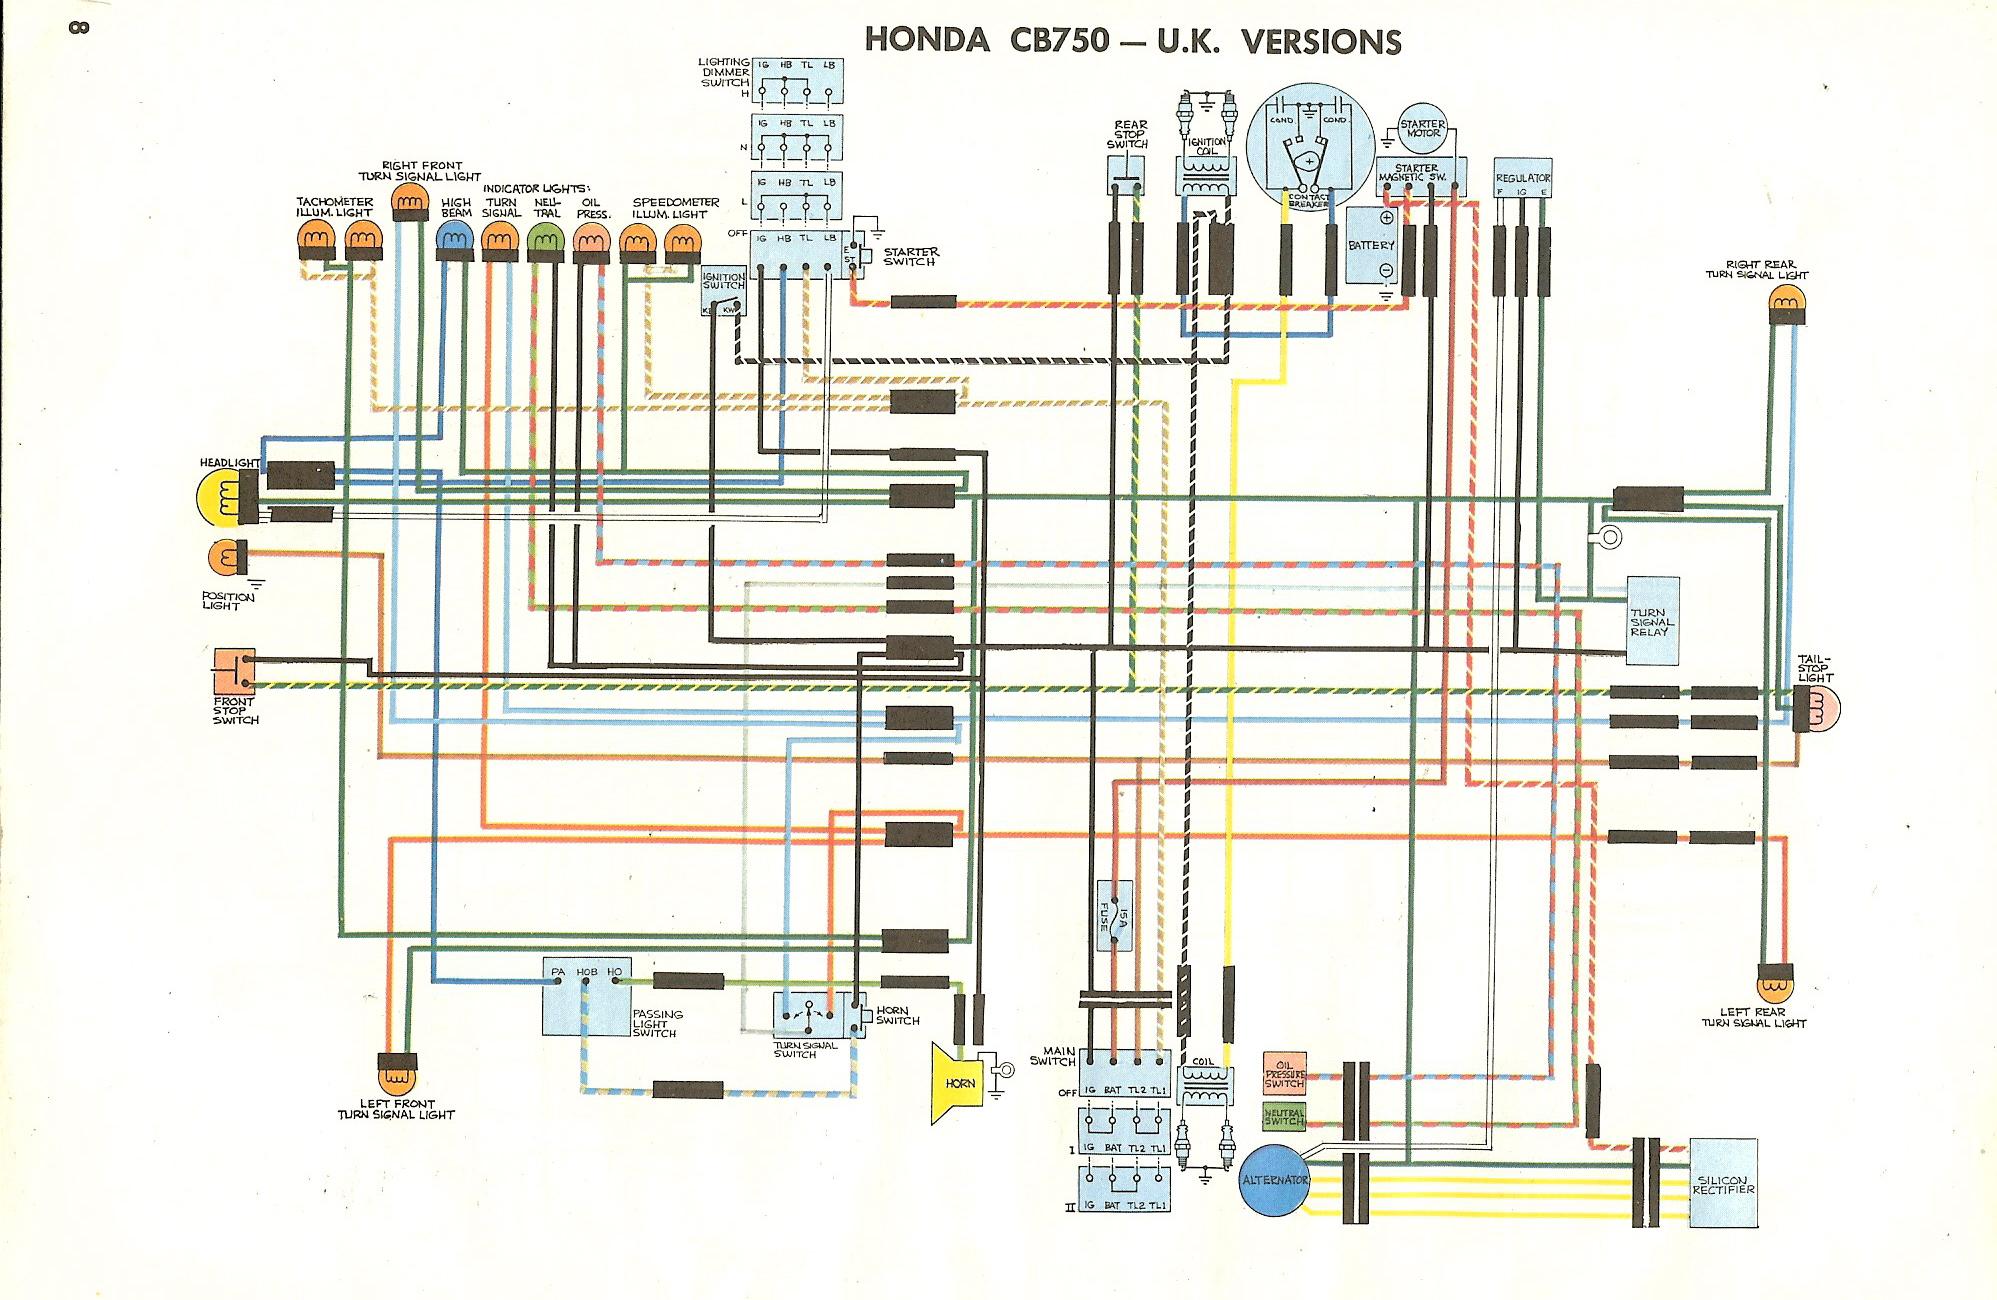 1975 Honda Cb750 Wiring Schematics – Honda Nighthawk Cb750 Wiring-diagram